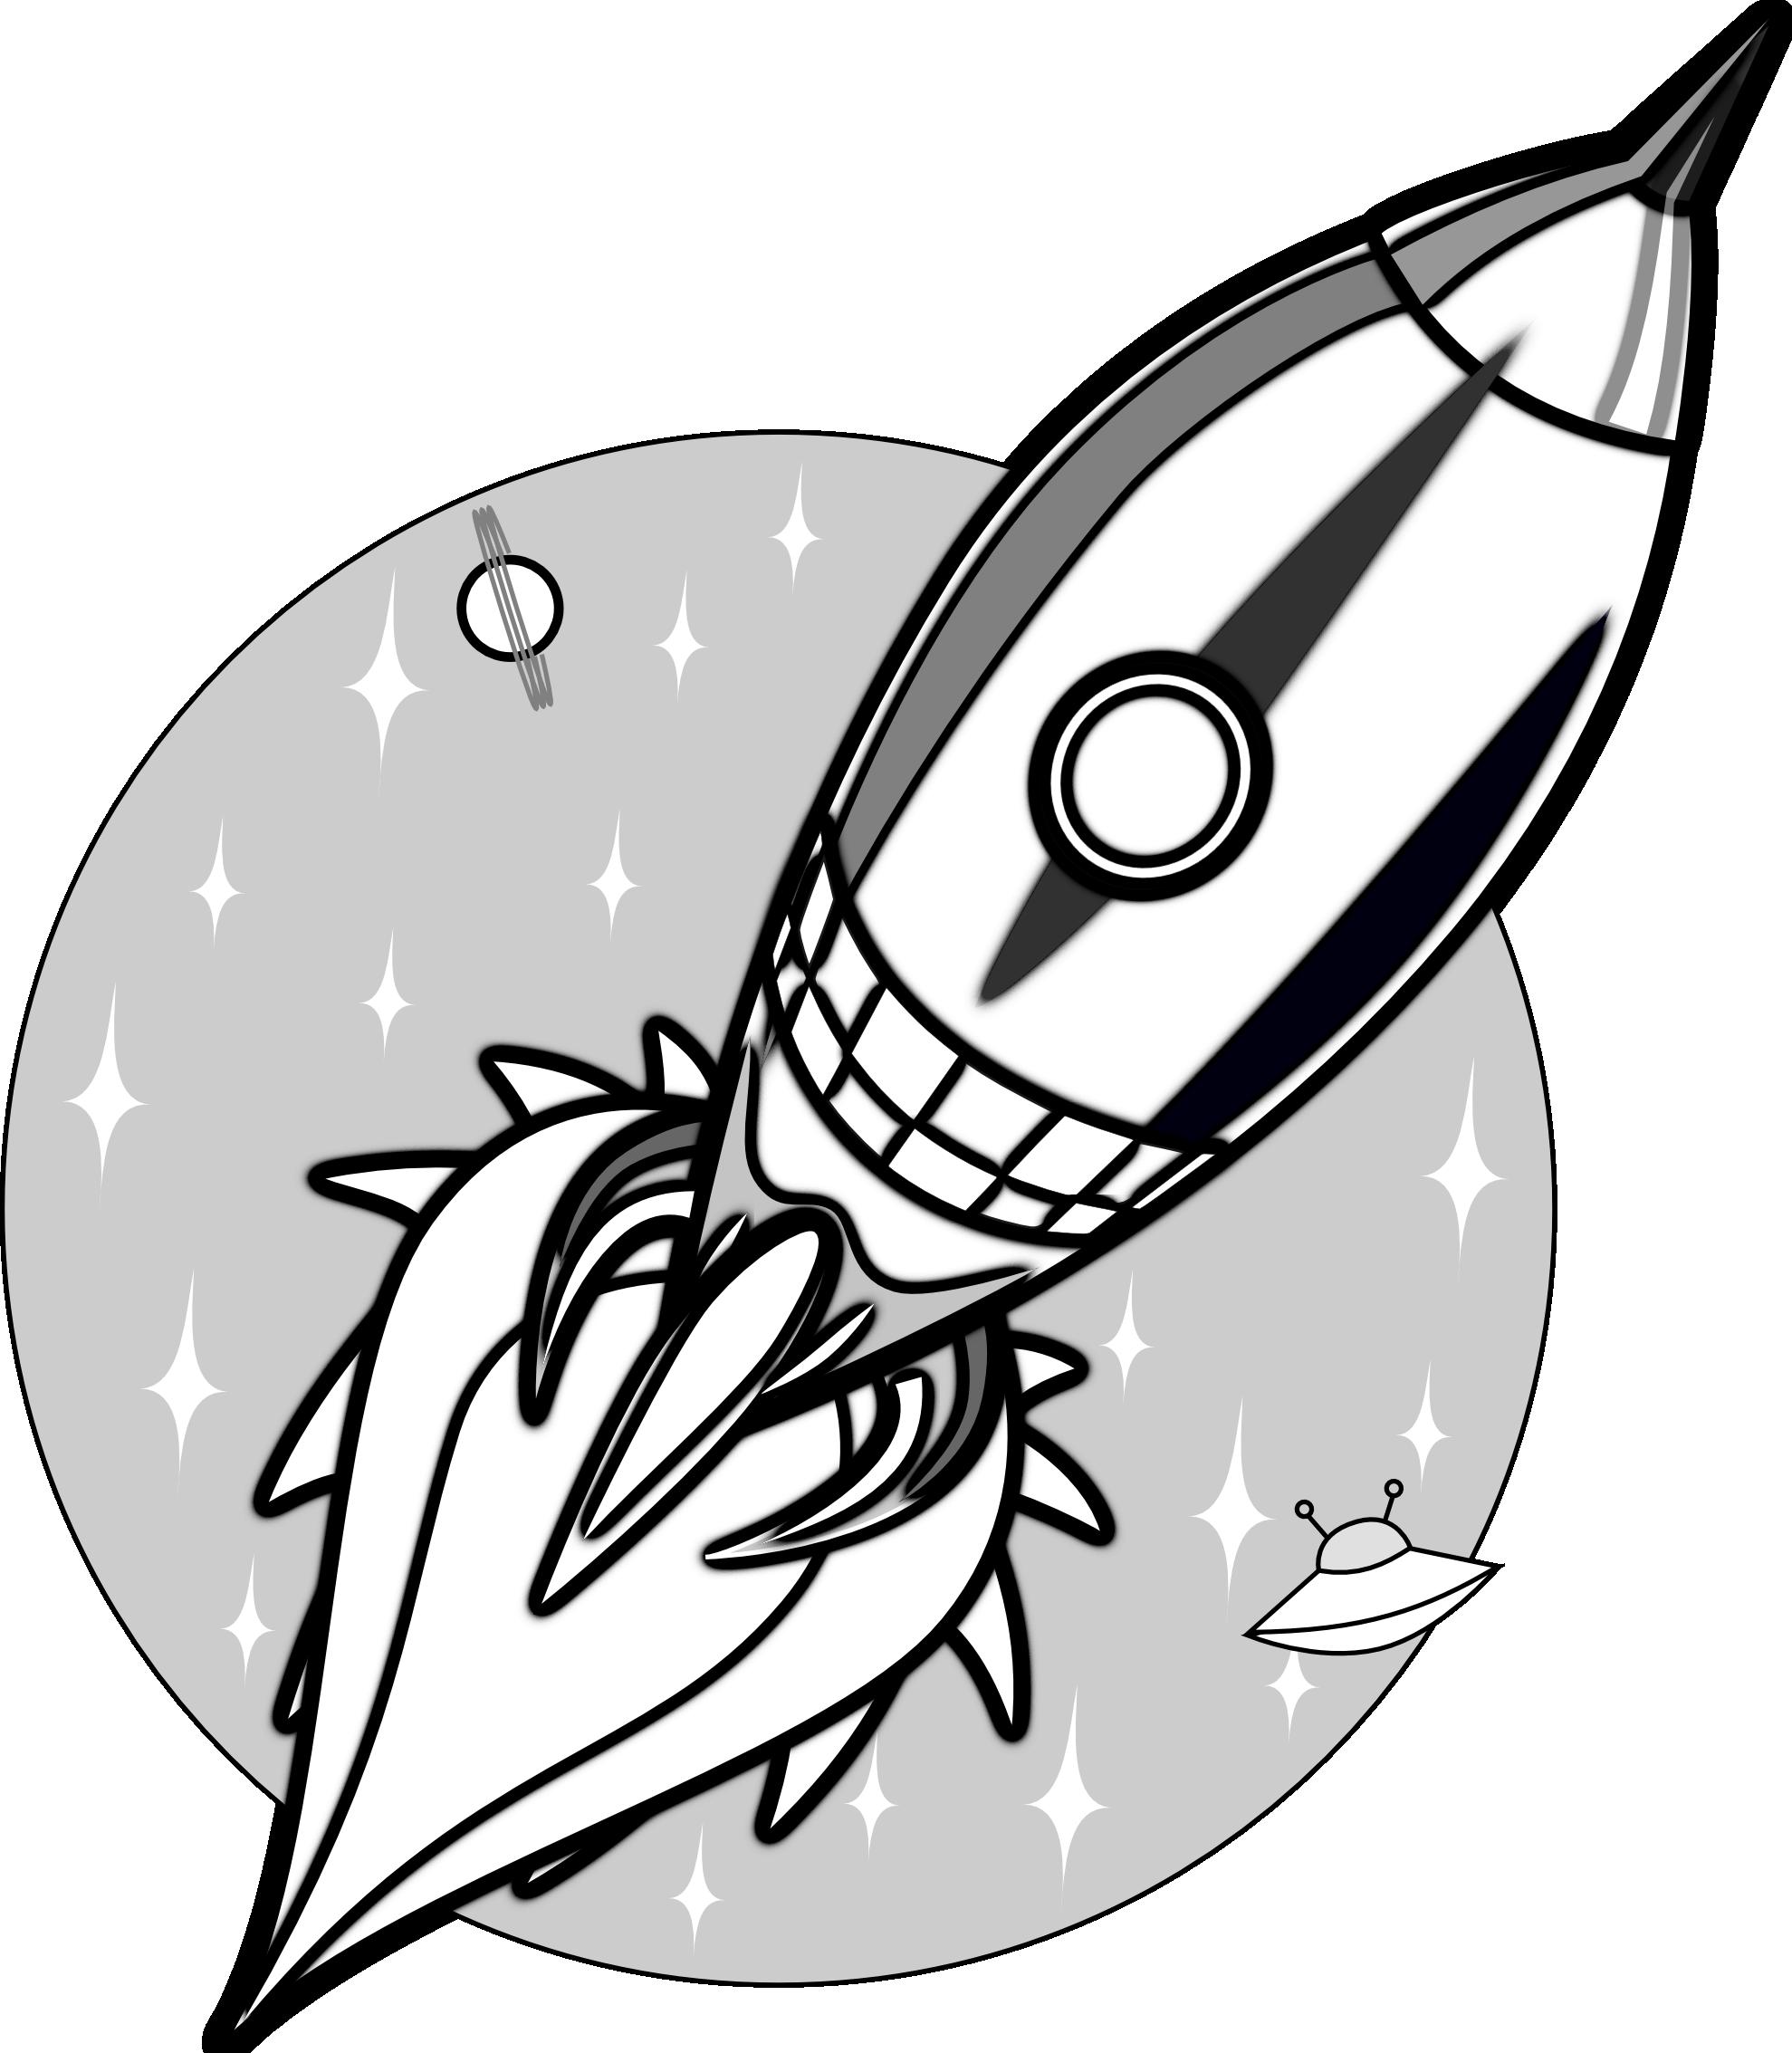 Space rocket clip art outline pics about space 2 image 2